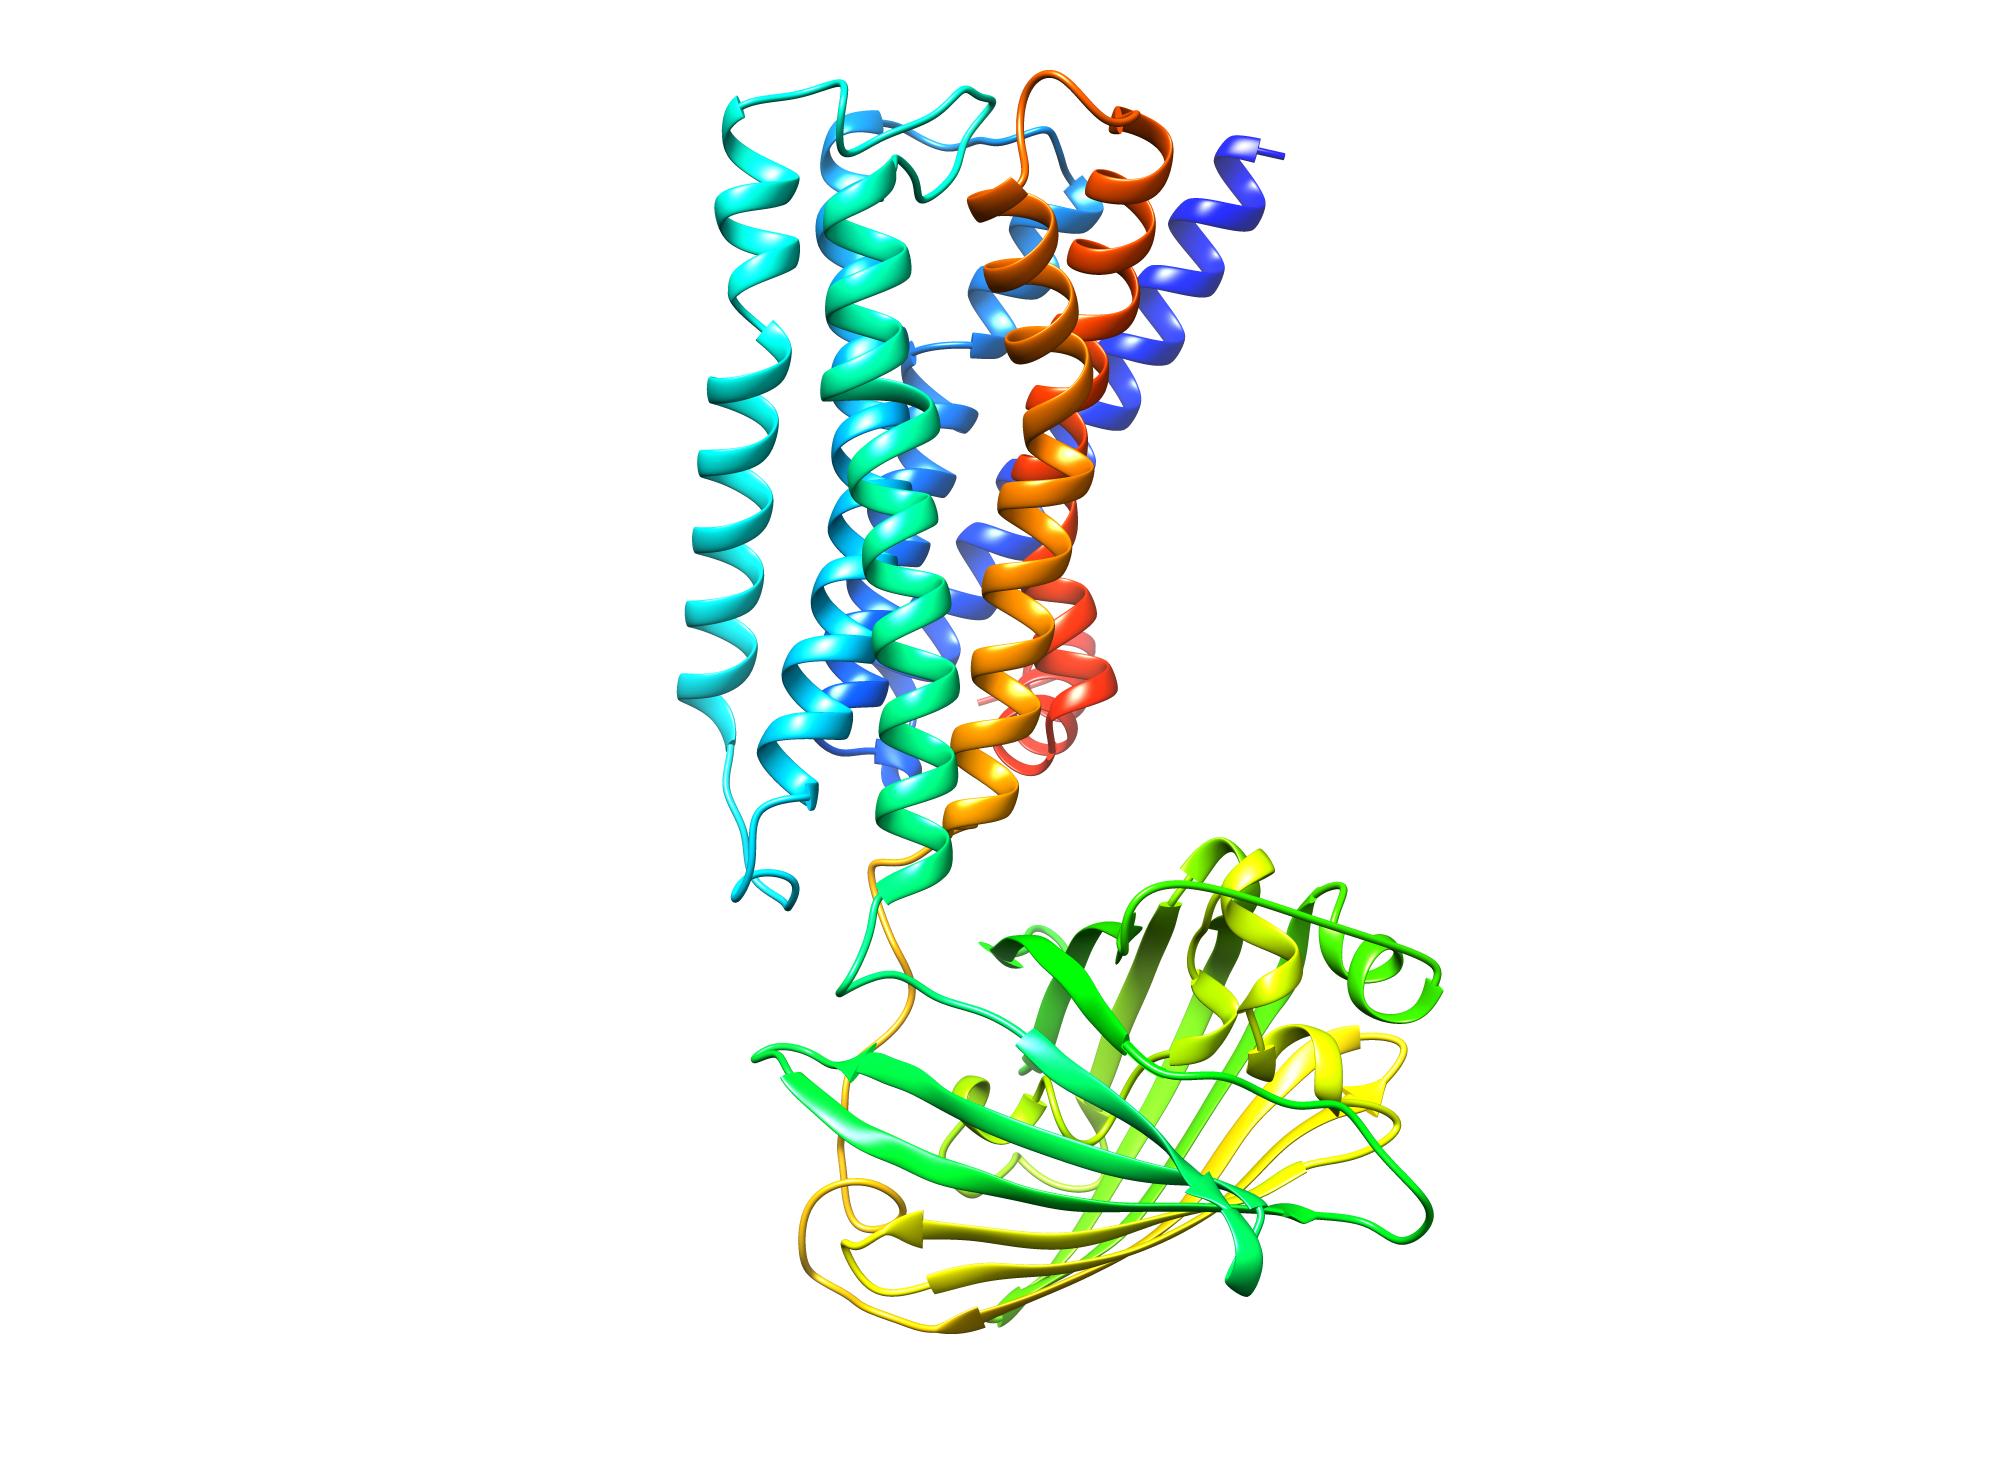 simulatedstructureofpsychlightconsistingof5 ht2ar(gray),alinker(magenta)andacpgfp(green) transparentbackgroundcreditdongetal1619610663752